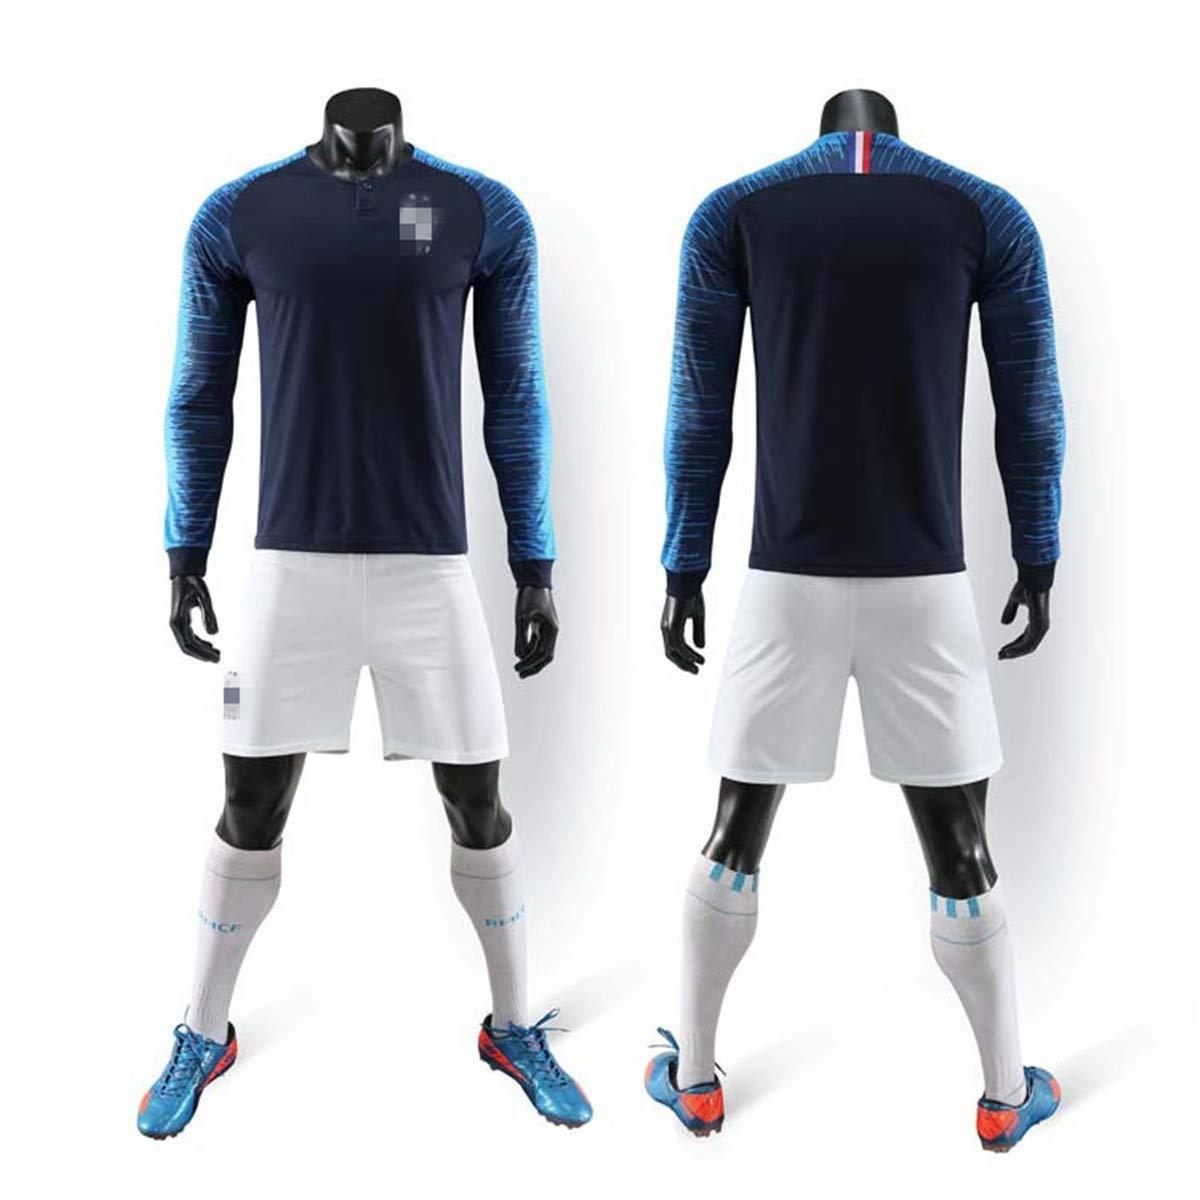 Coloriage De Foot Real Madrid.Coloriage Maillot De Foot Real Madrid Www Papedelca Com